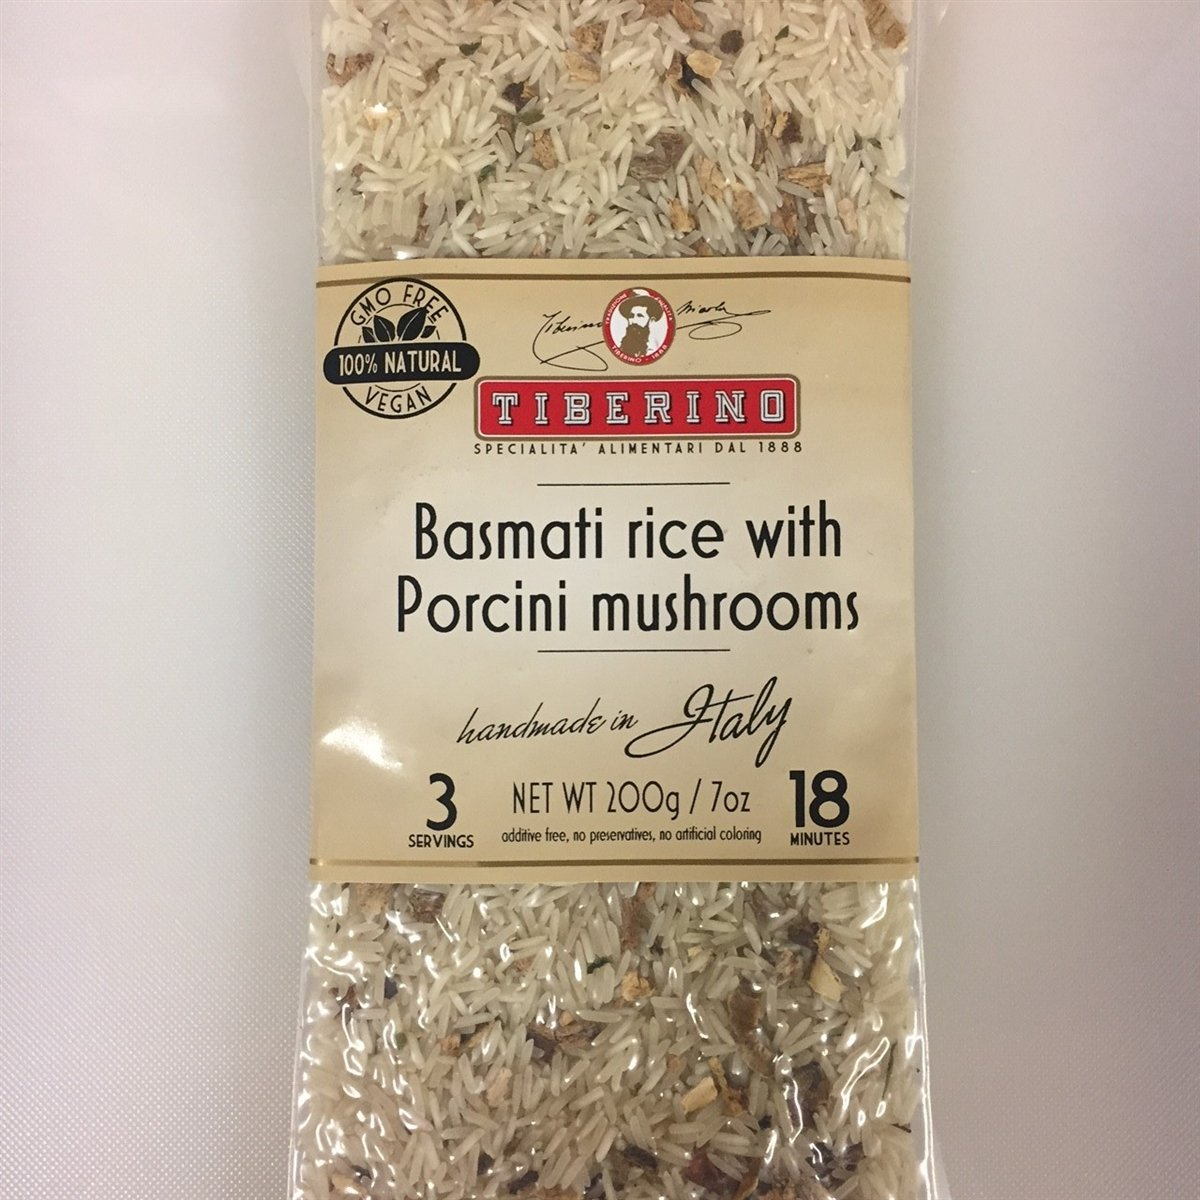 Tiberino's Real Italian Meals - Basmati Rice with Porcini Mushroom by Tiberino